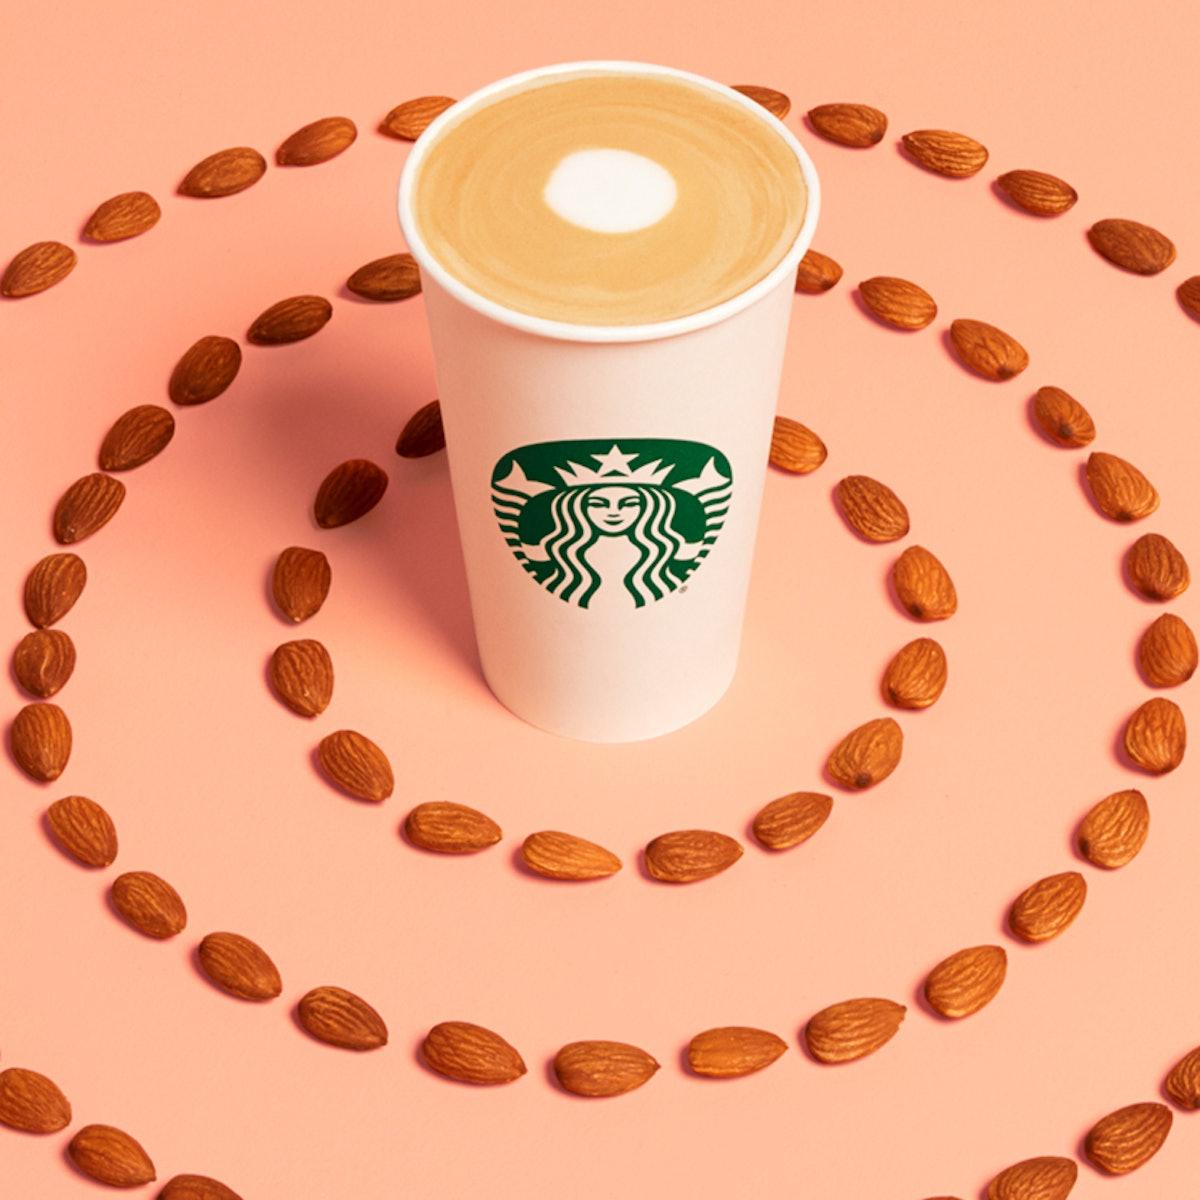 Starbucks' New Non-Dairy Beverages Include The Almondmilk Honey Flat White.